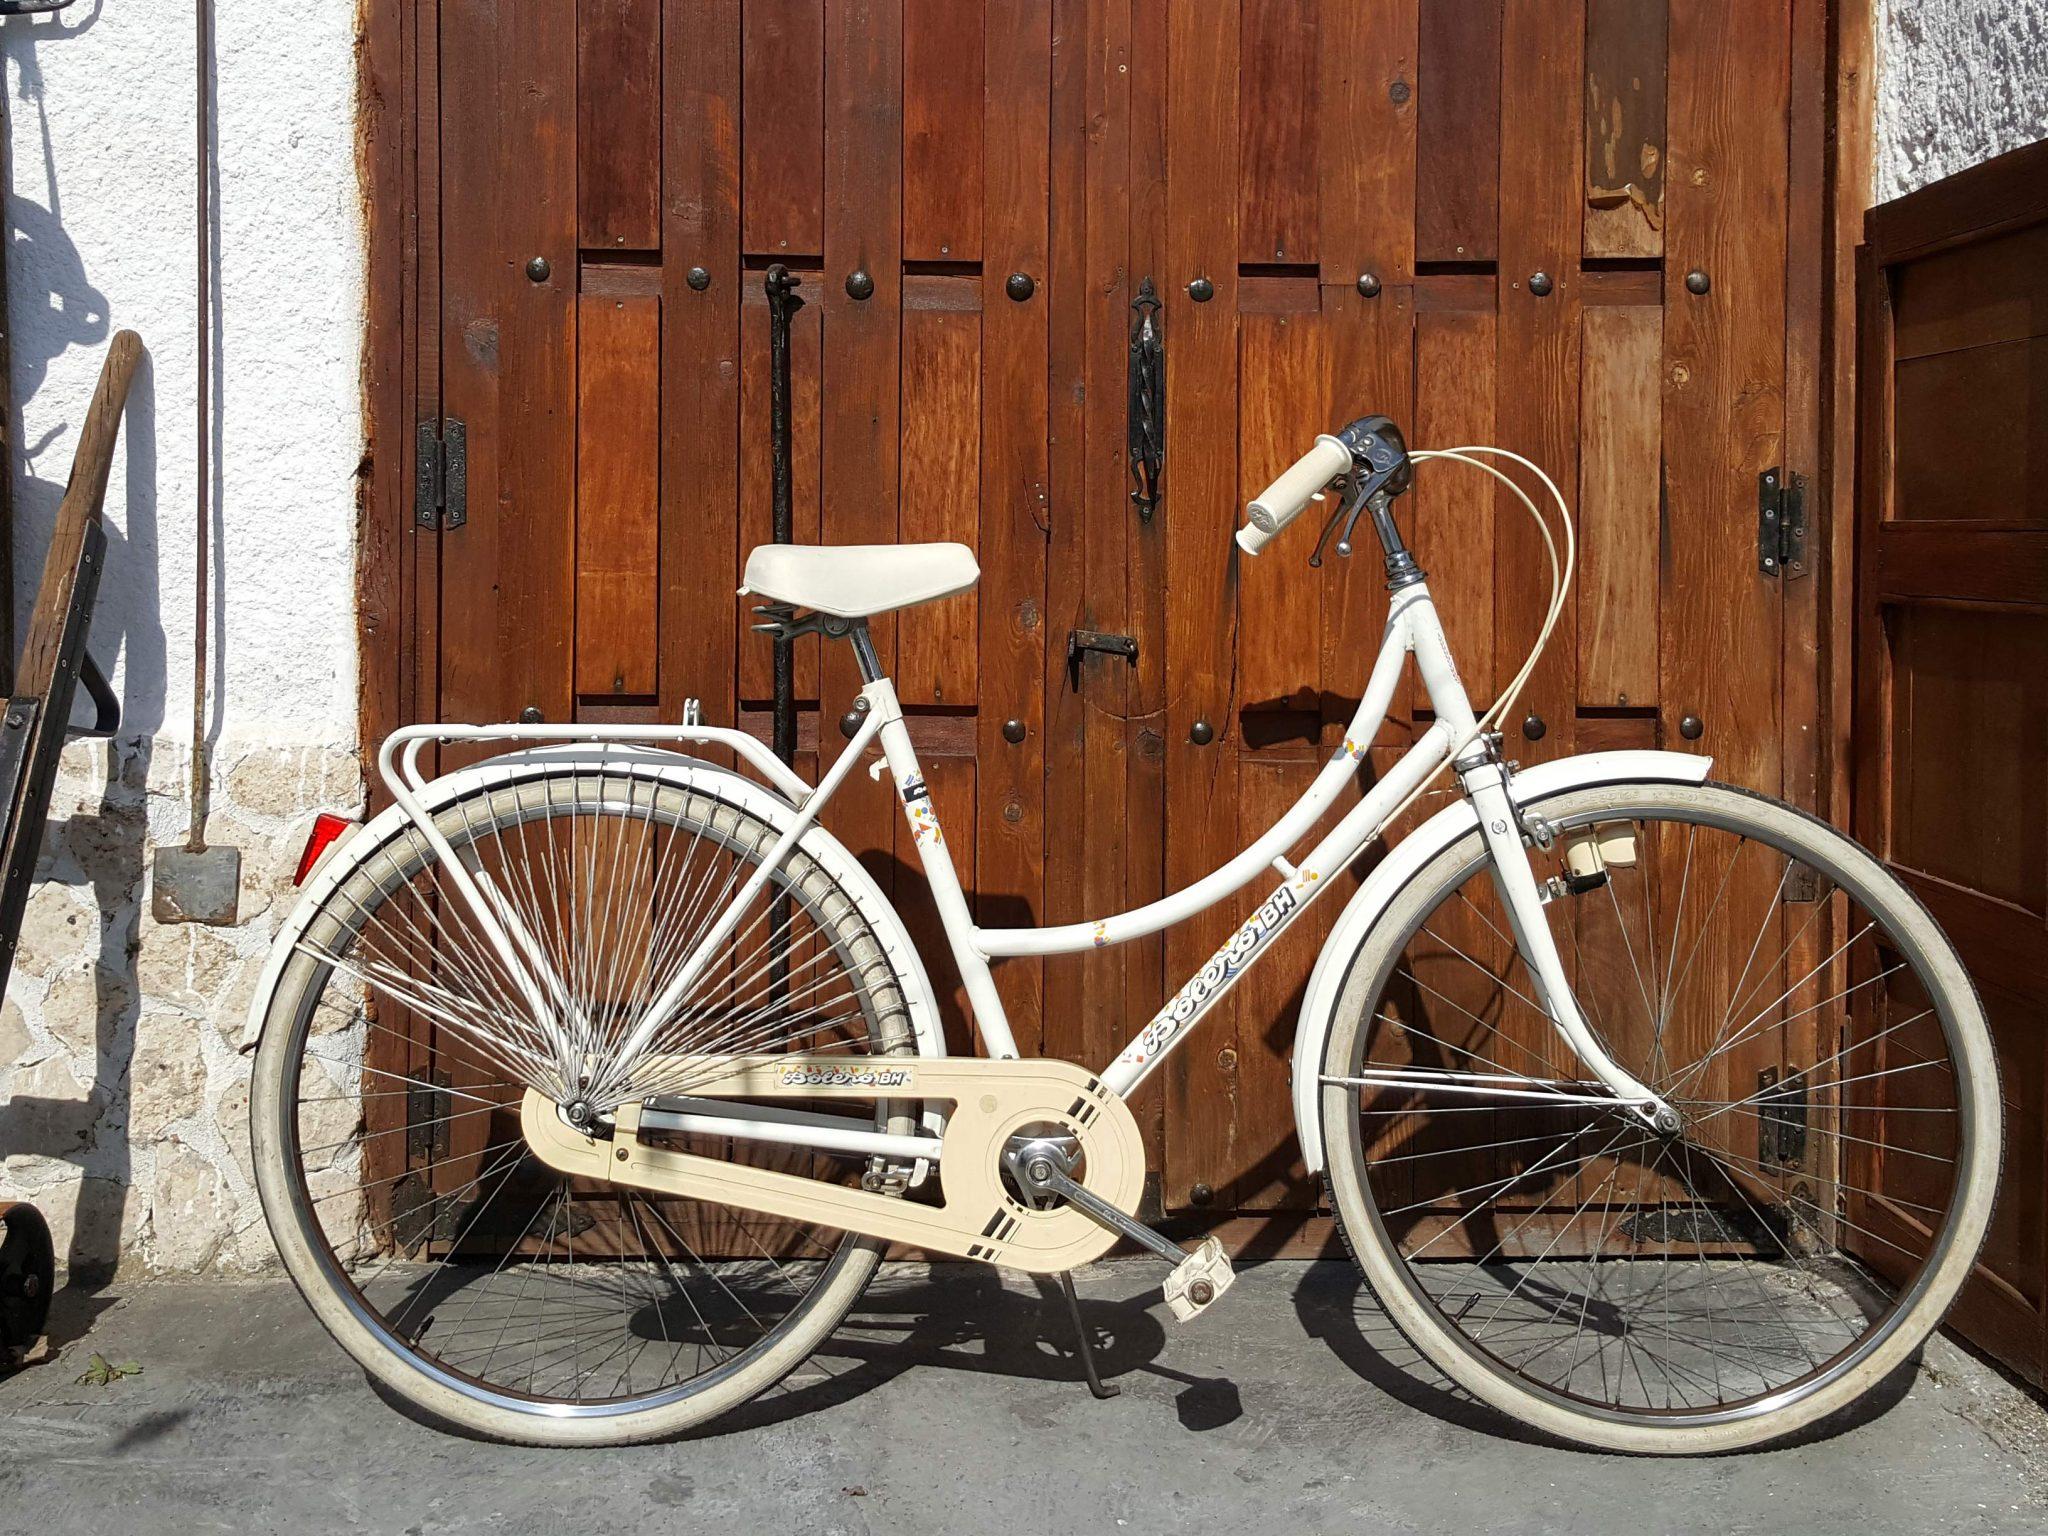 Los Martínez Banco de bicis Alquiler bicicletas especiales Ana Belén Portugal Cascais BH Bolero blanca